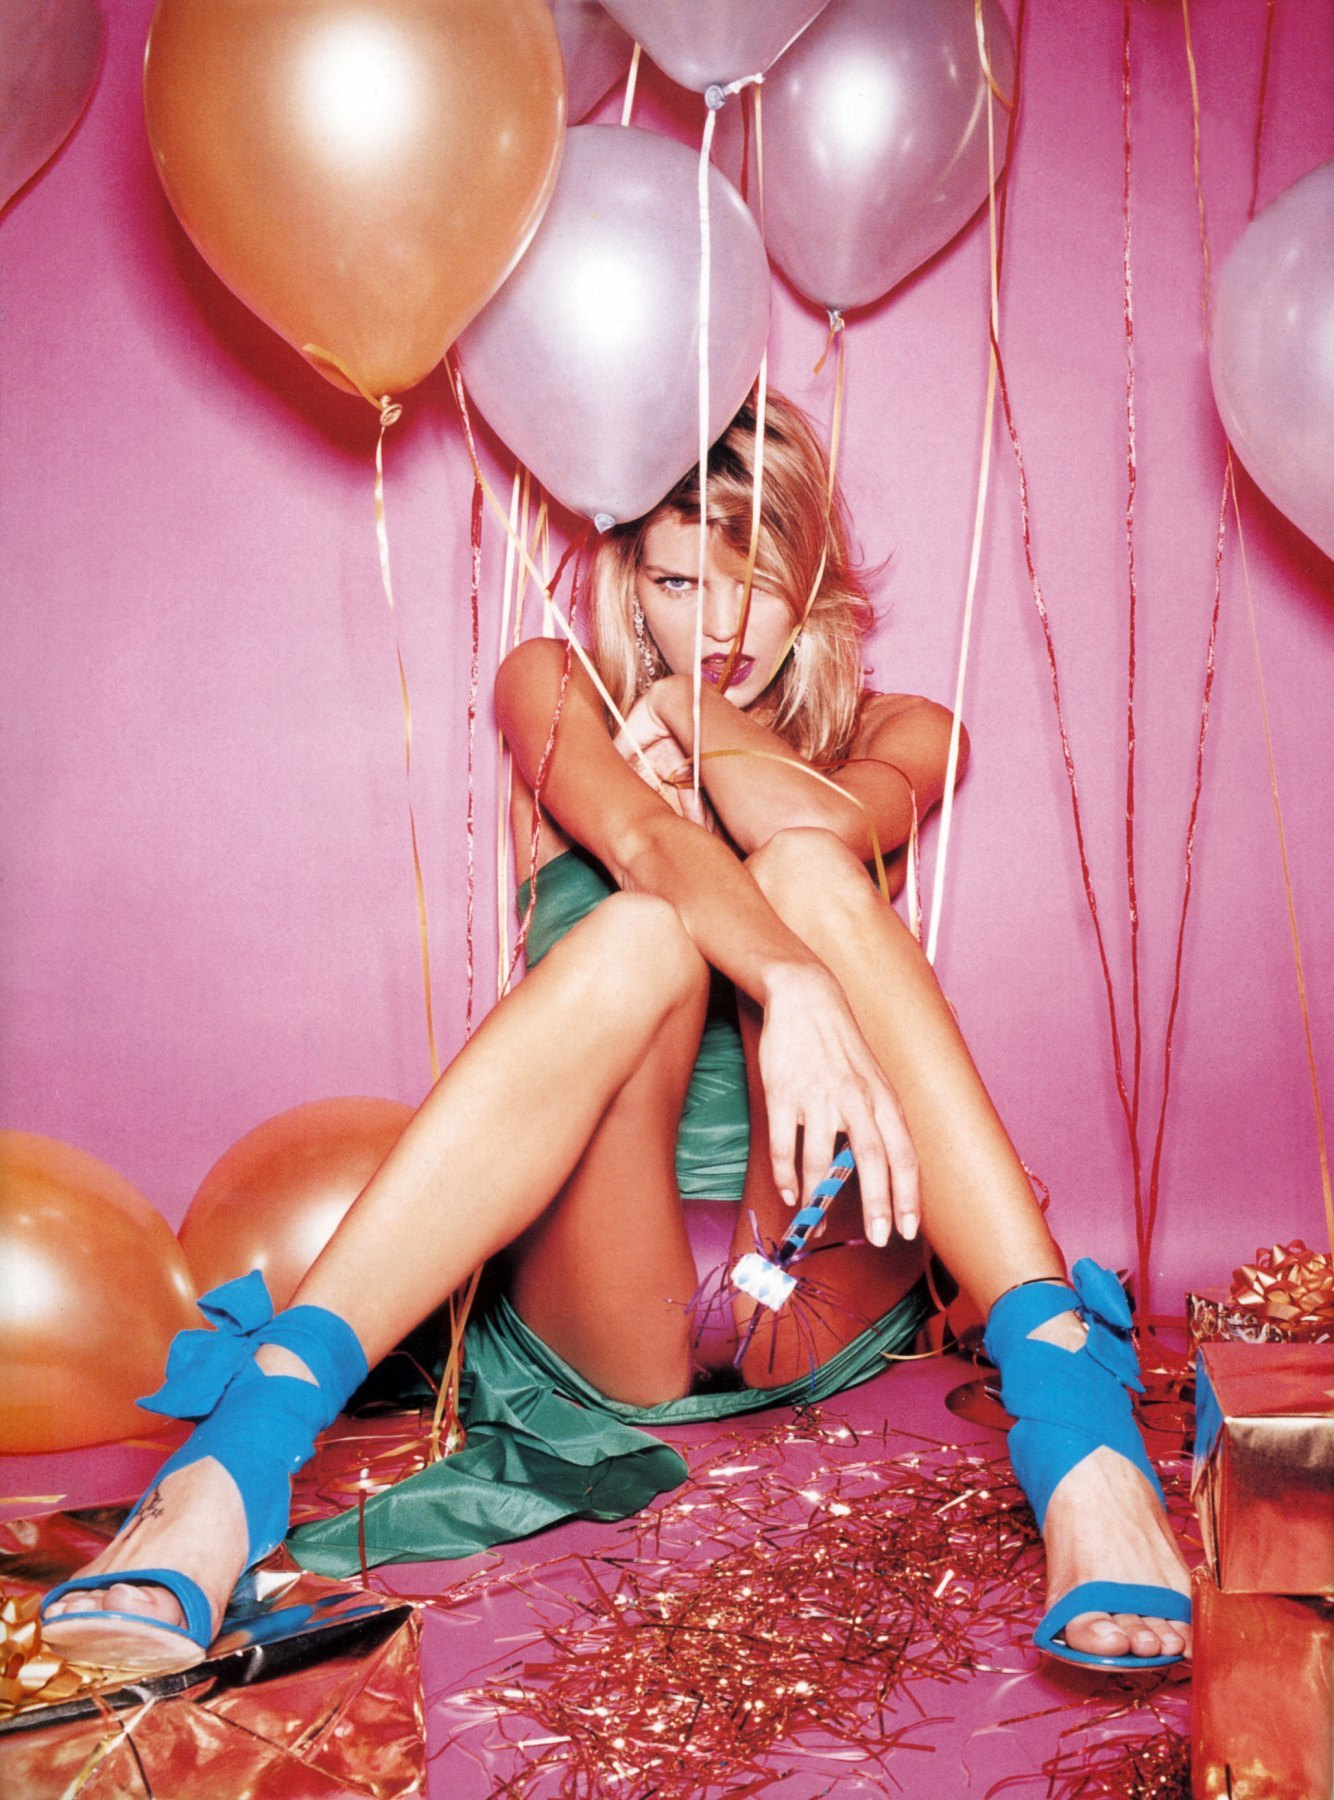 Feet May Andersen nude (38 photo), Pussy, Fappening, Instagram, underwear 2018